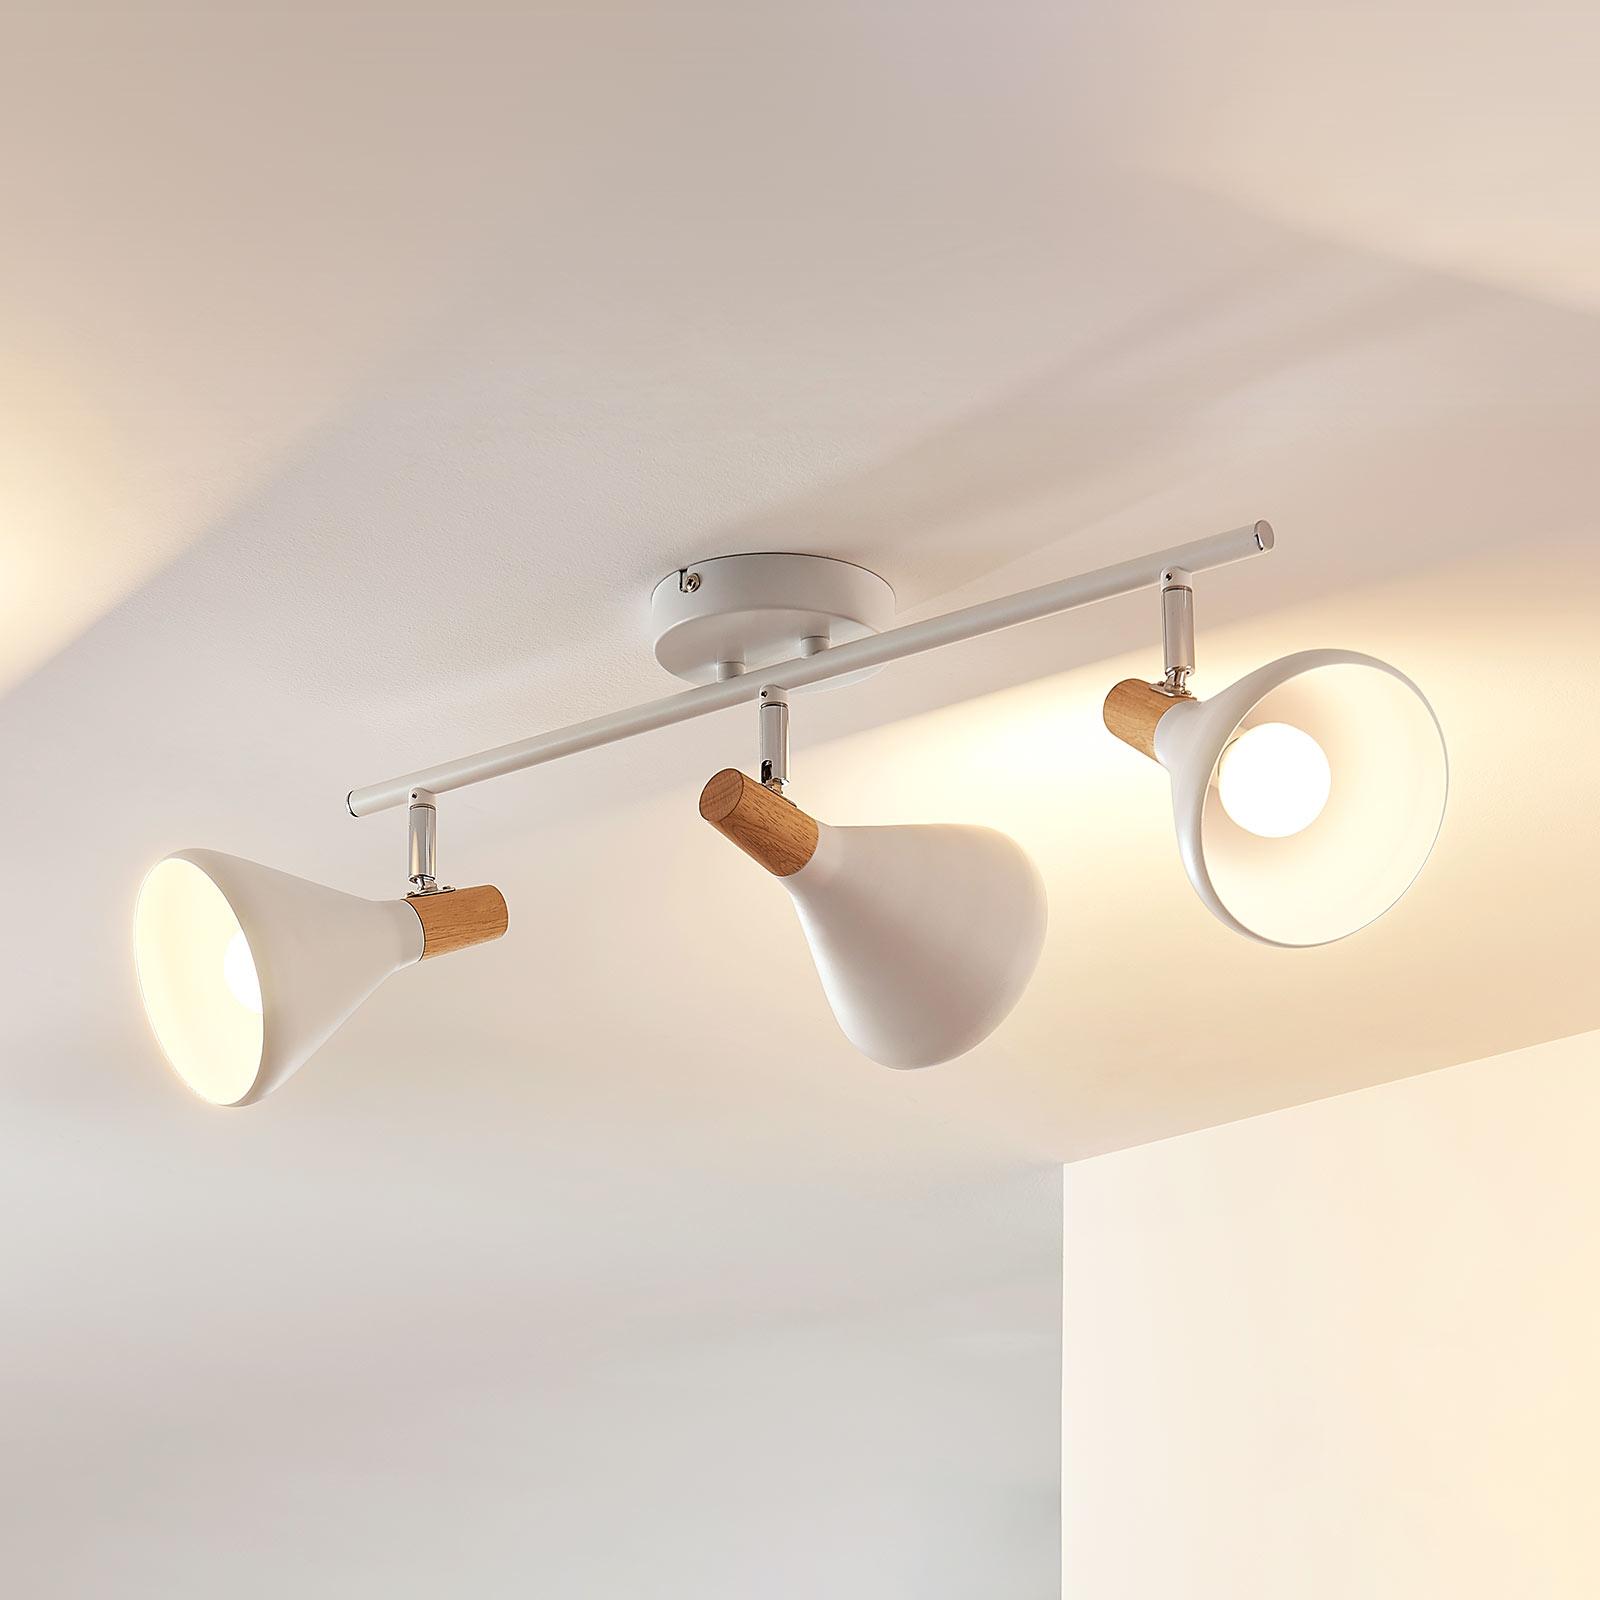 Plafoniera LED Arina a 3 luci, bianca